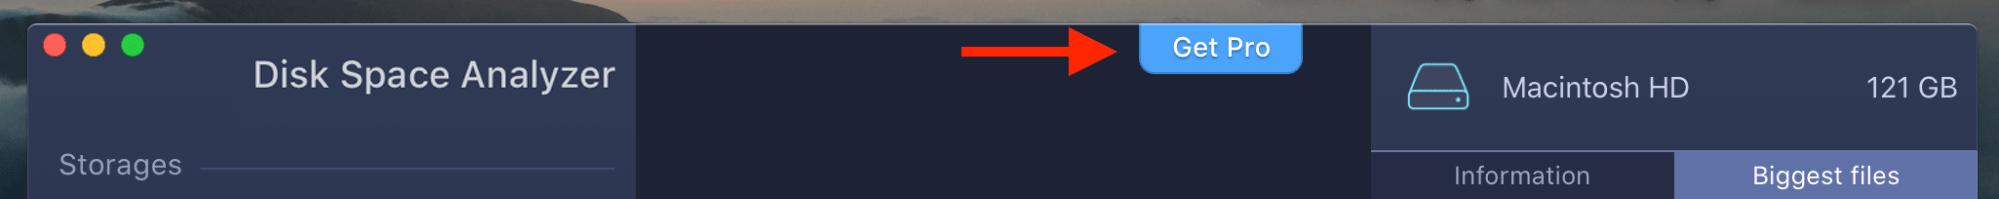 getting pro button in Disk Space Analyzer window